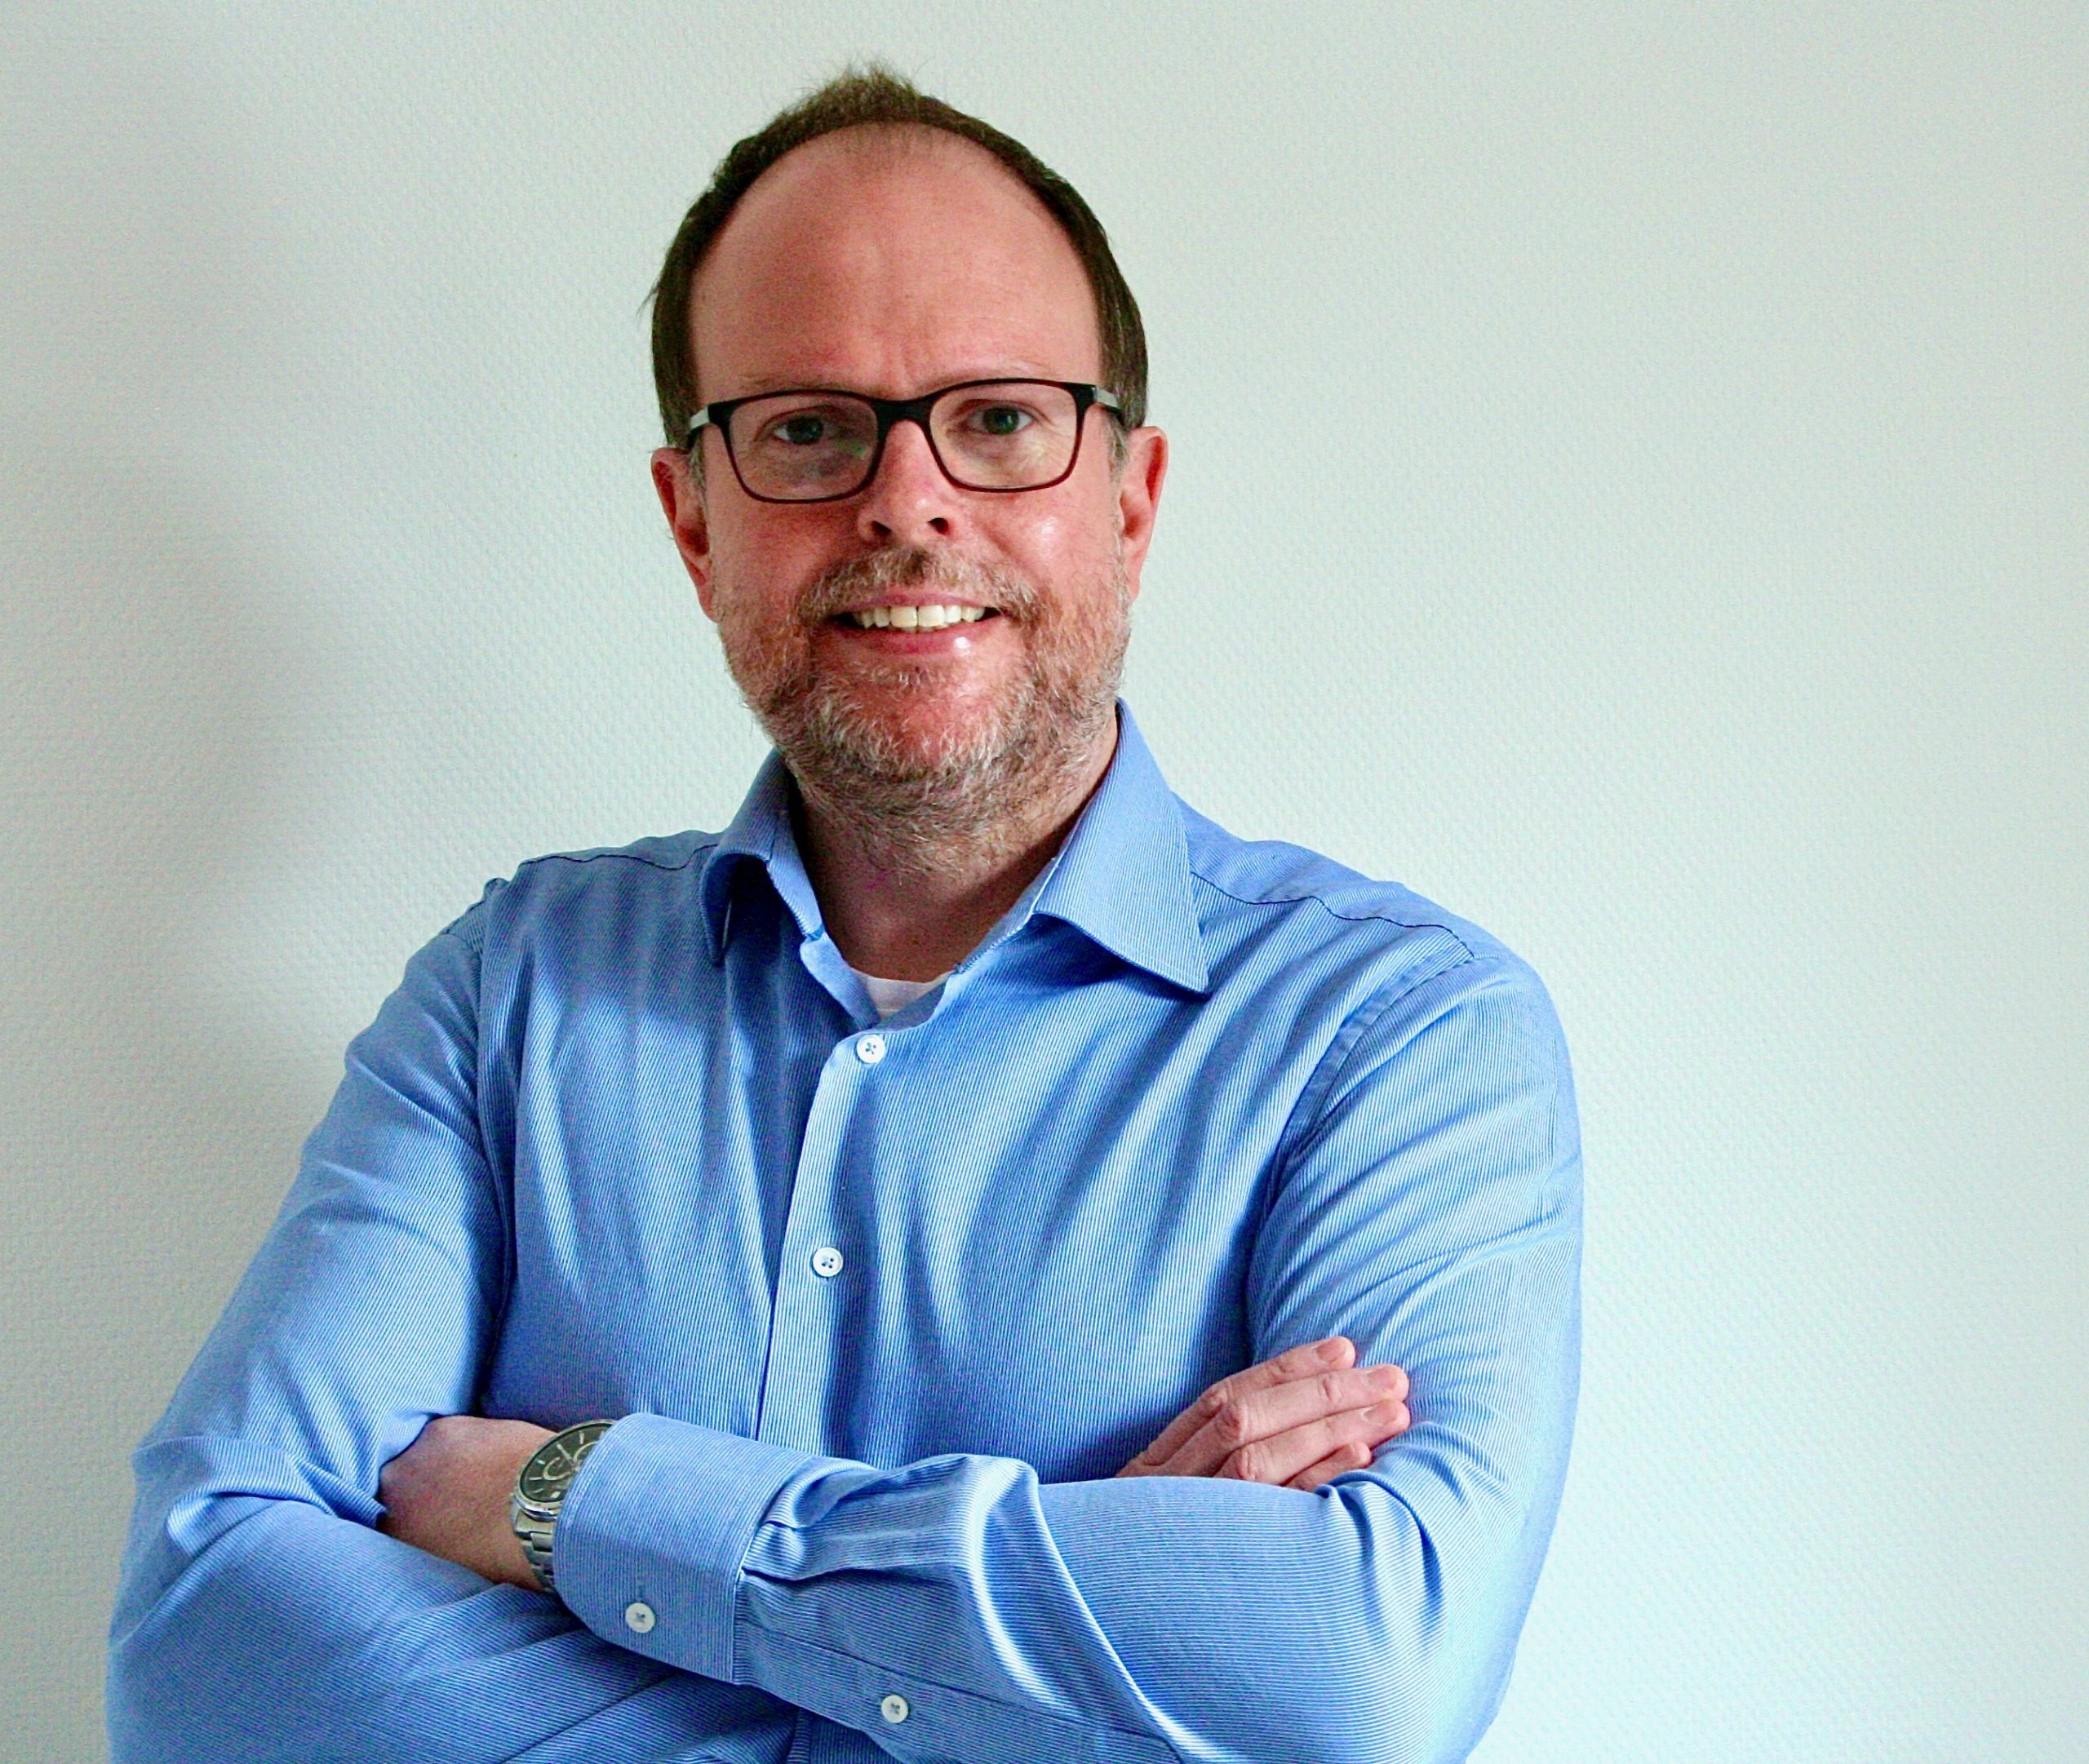 Kurt Doornaert